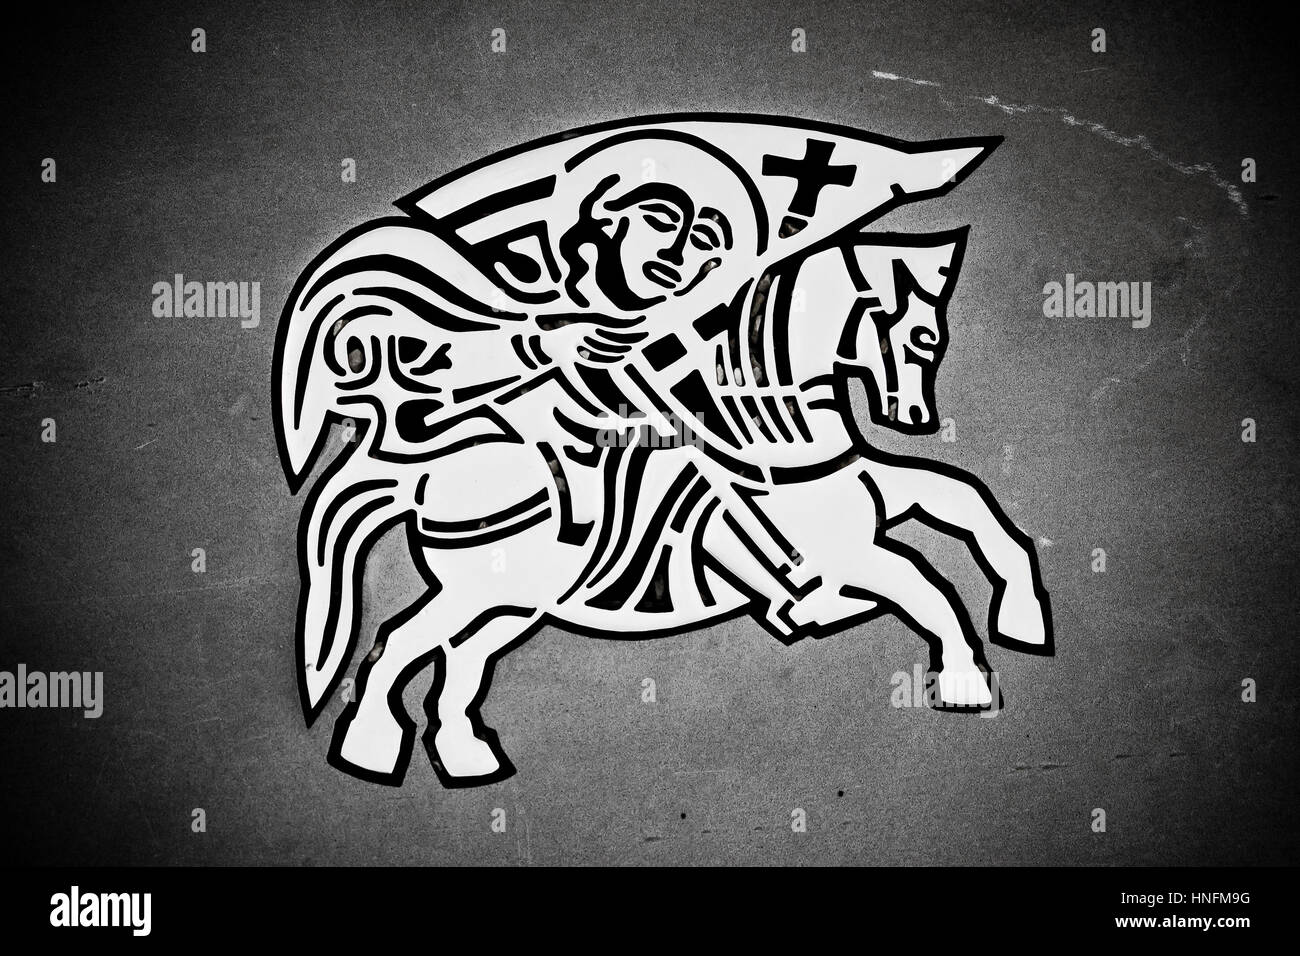 Knight on the horse - Zadar city seal street symbol - Stock Image